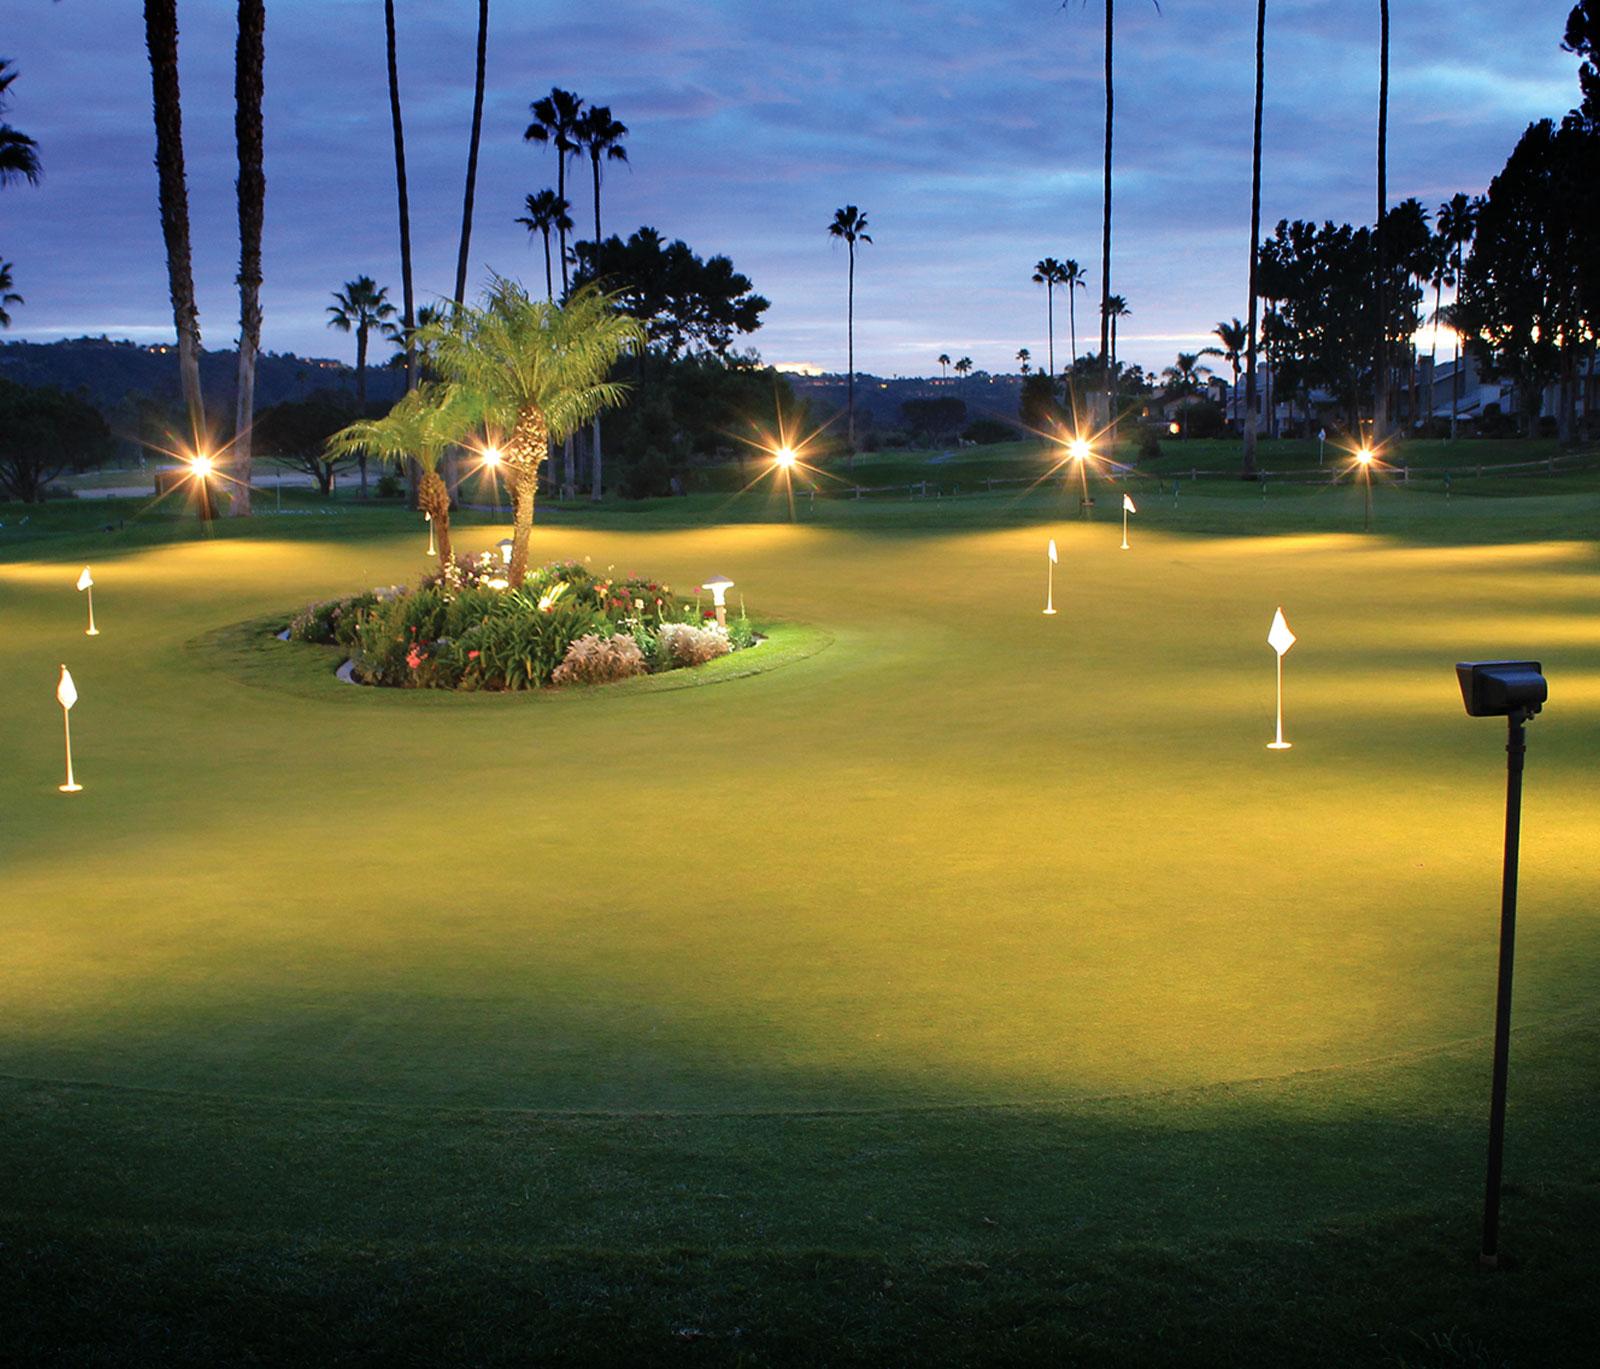 Golf Lighting